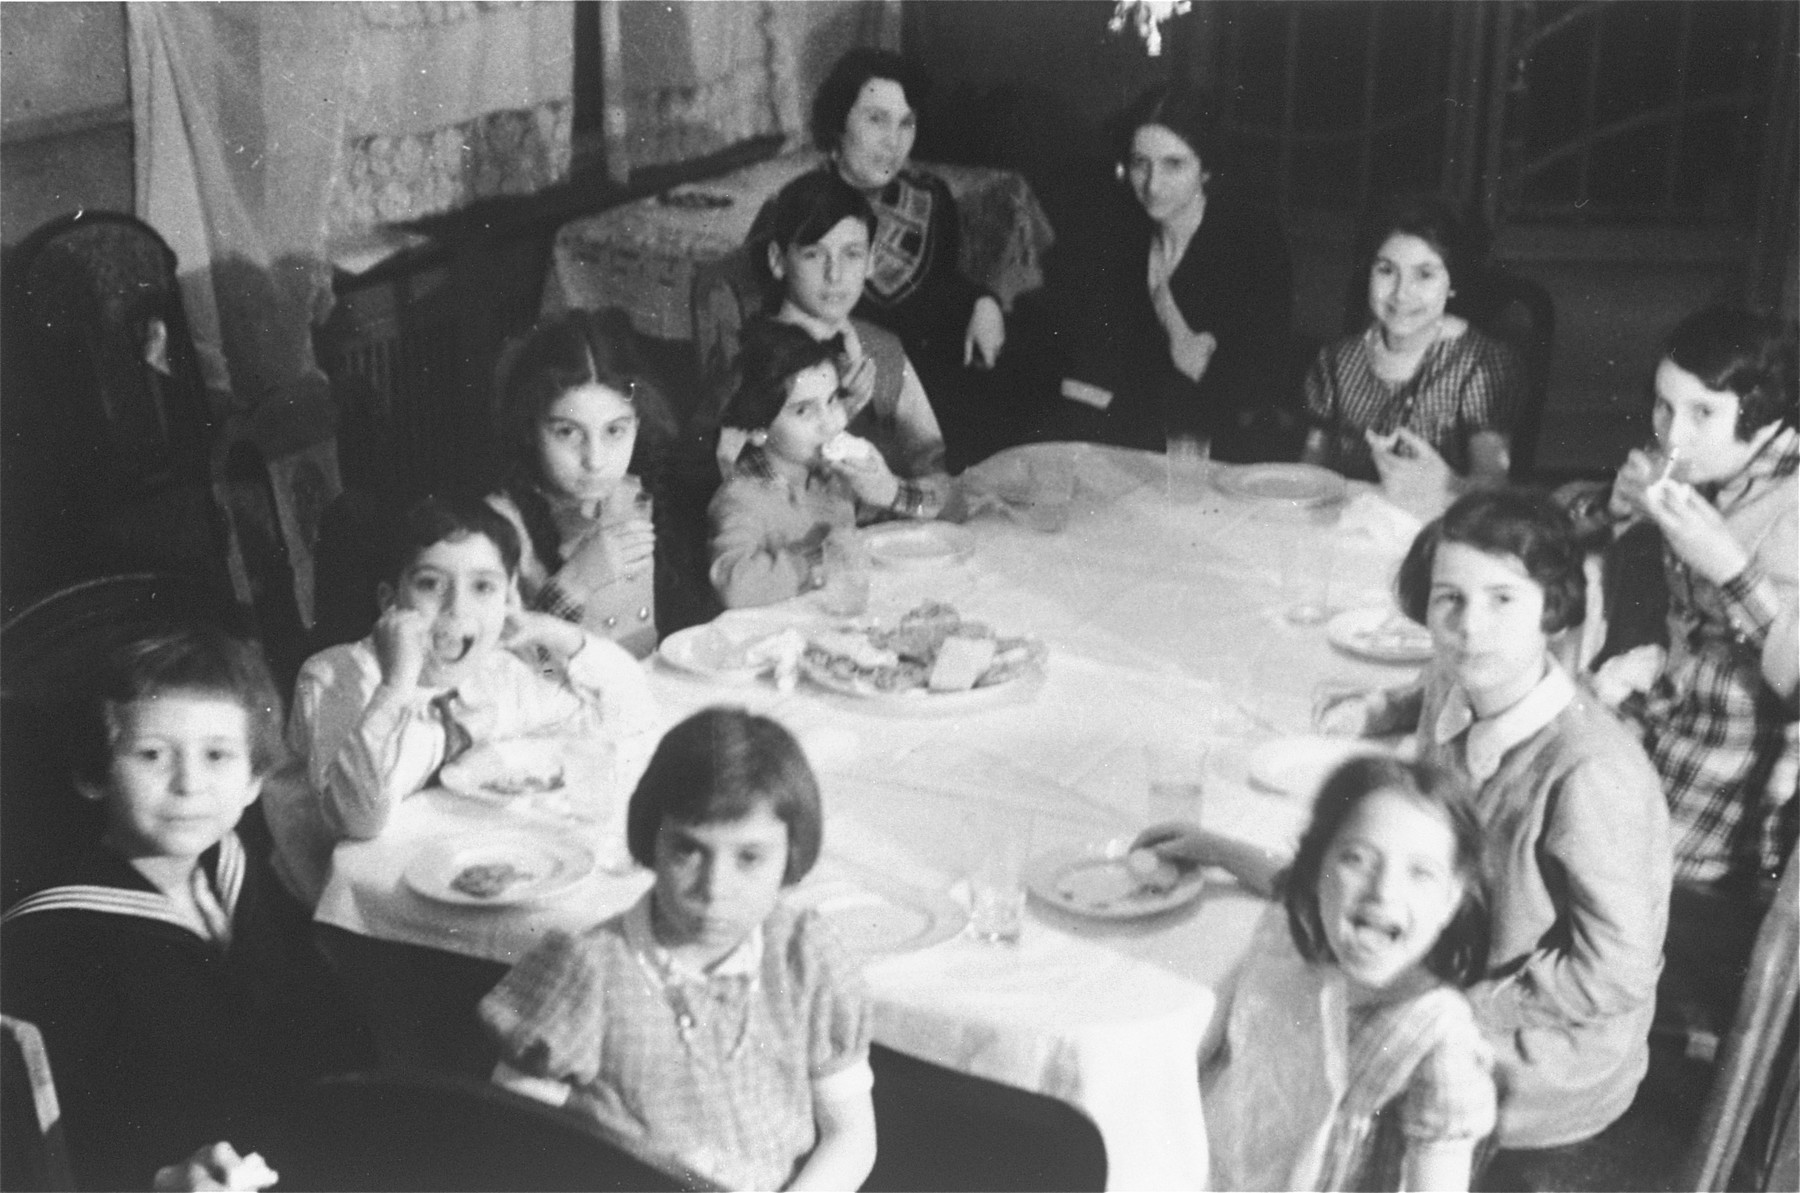 Children seated around a table at a birthday party for Eva Anker at her home on Klopstockstrasse 17 in Berlin.   Pictured clockwise from the bottom left are: Theo Olof (?); Heinz Karplus (cousin), Dodi Anker, Hilda  Anker, Klaus Loewald, Olga Jacobson, Gertrud Anker, Hannele Ephraimsohn, Eva Anker, Annelise Lowald, Else Karplus (cousin) and Hanna Jacobson (friend).